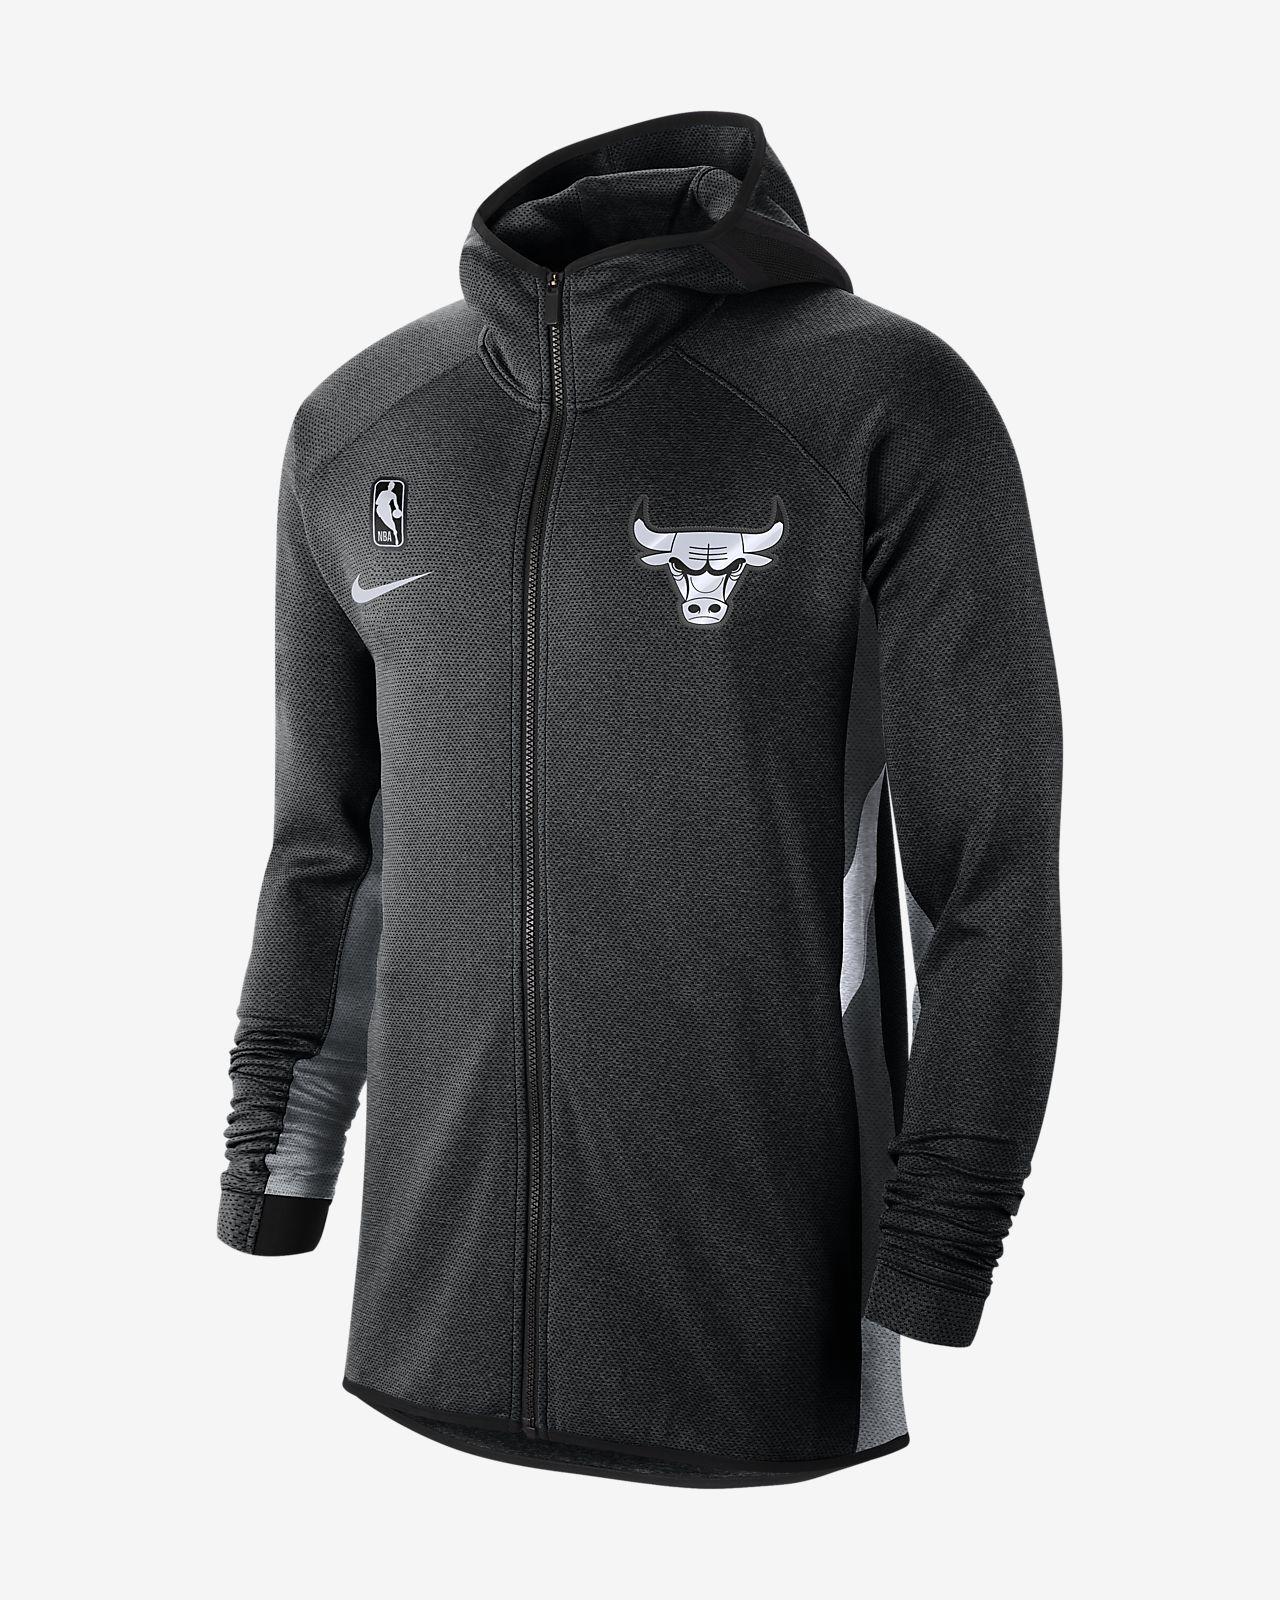 Chicago Bulls Nike Therma Flex Showtime Men's NBA Hoodie